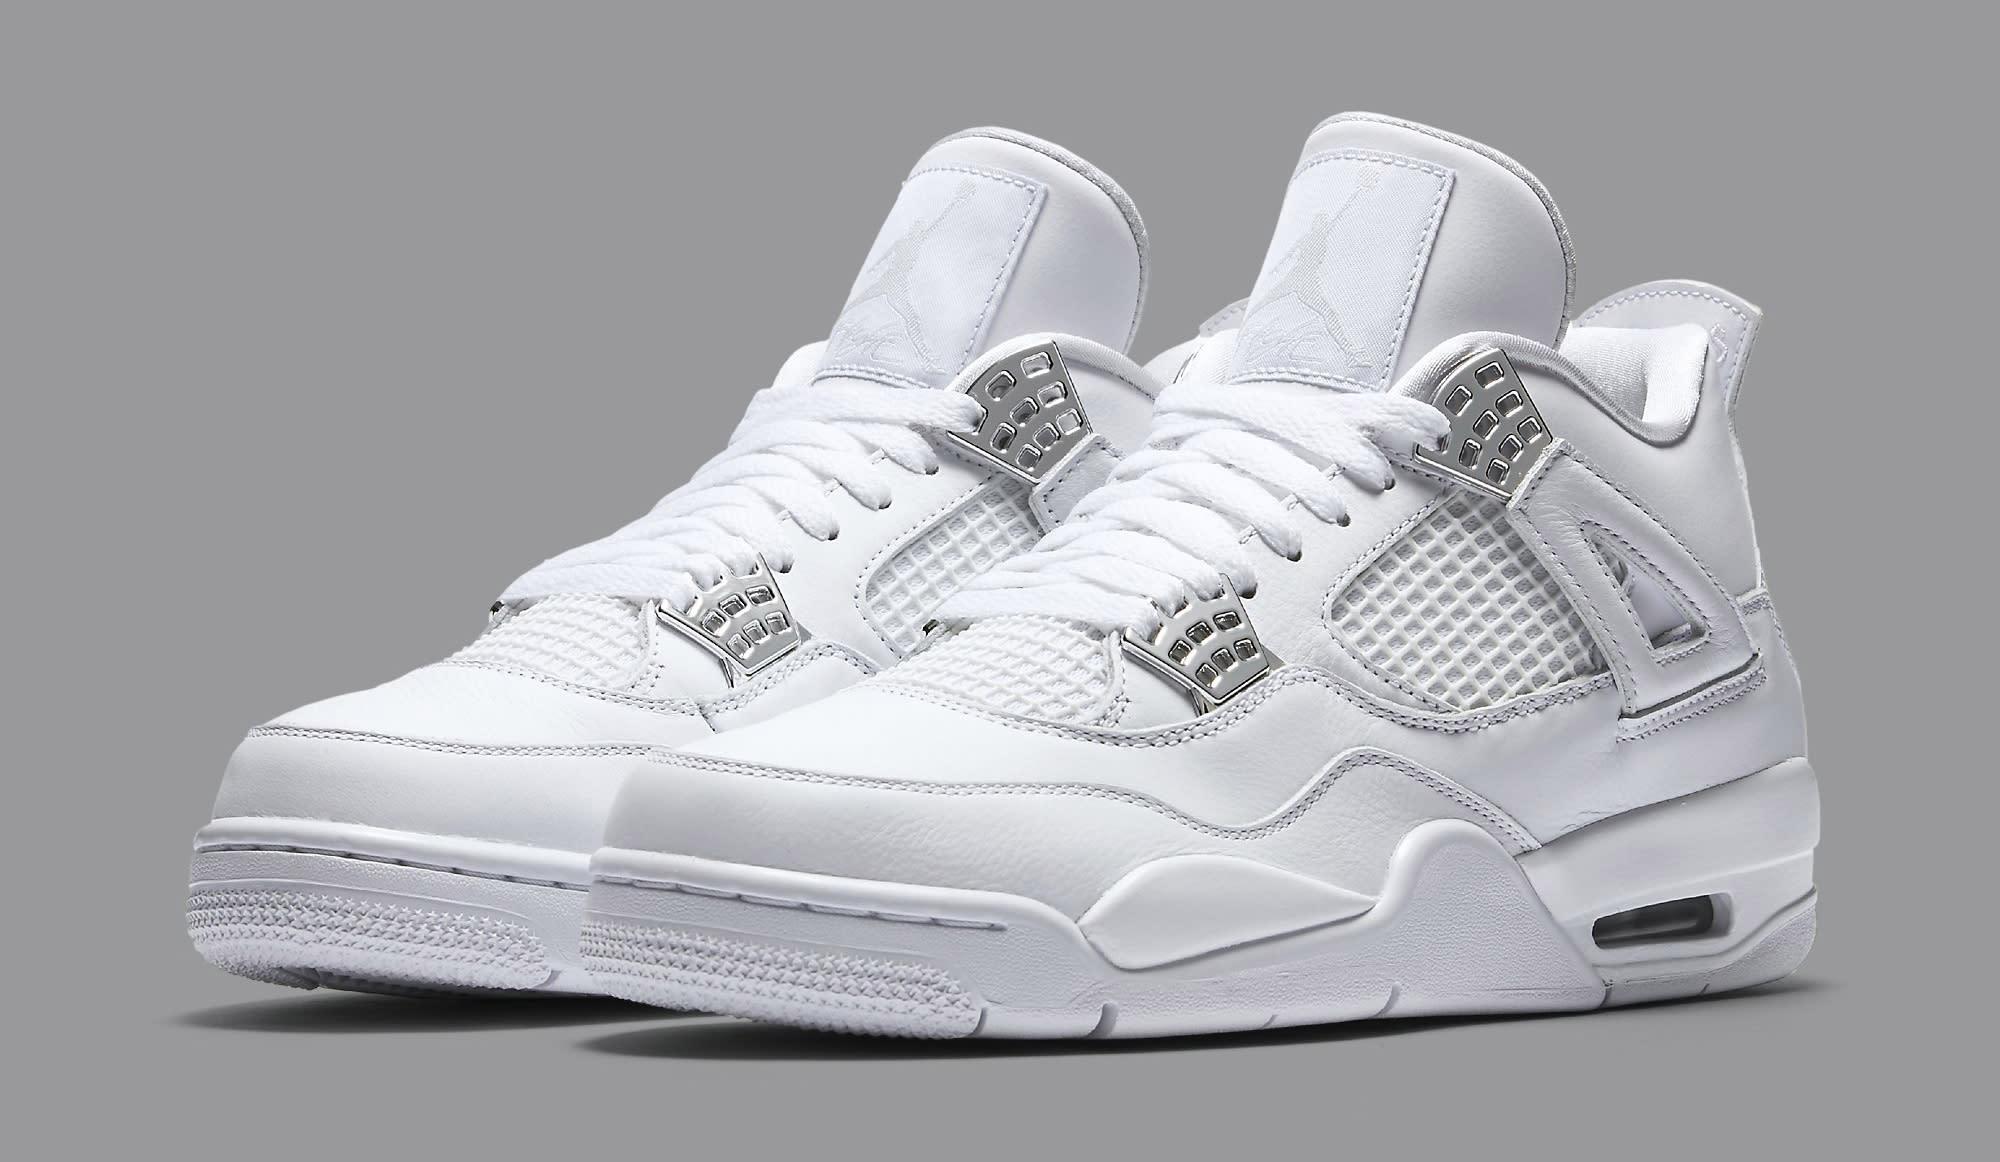 Air 4 Retro Pure Money Men Lifestyle Sneakers New White - 11 5fsbRLCErc